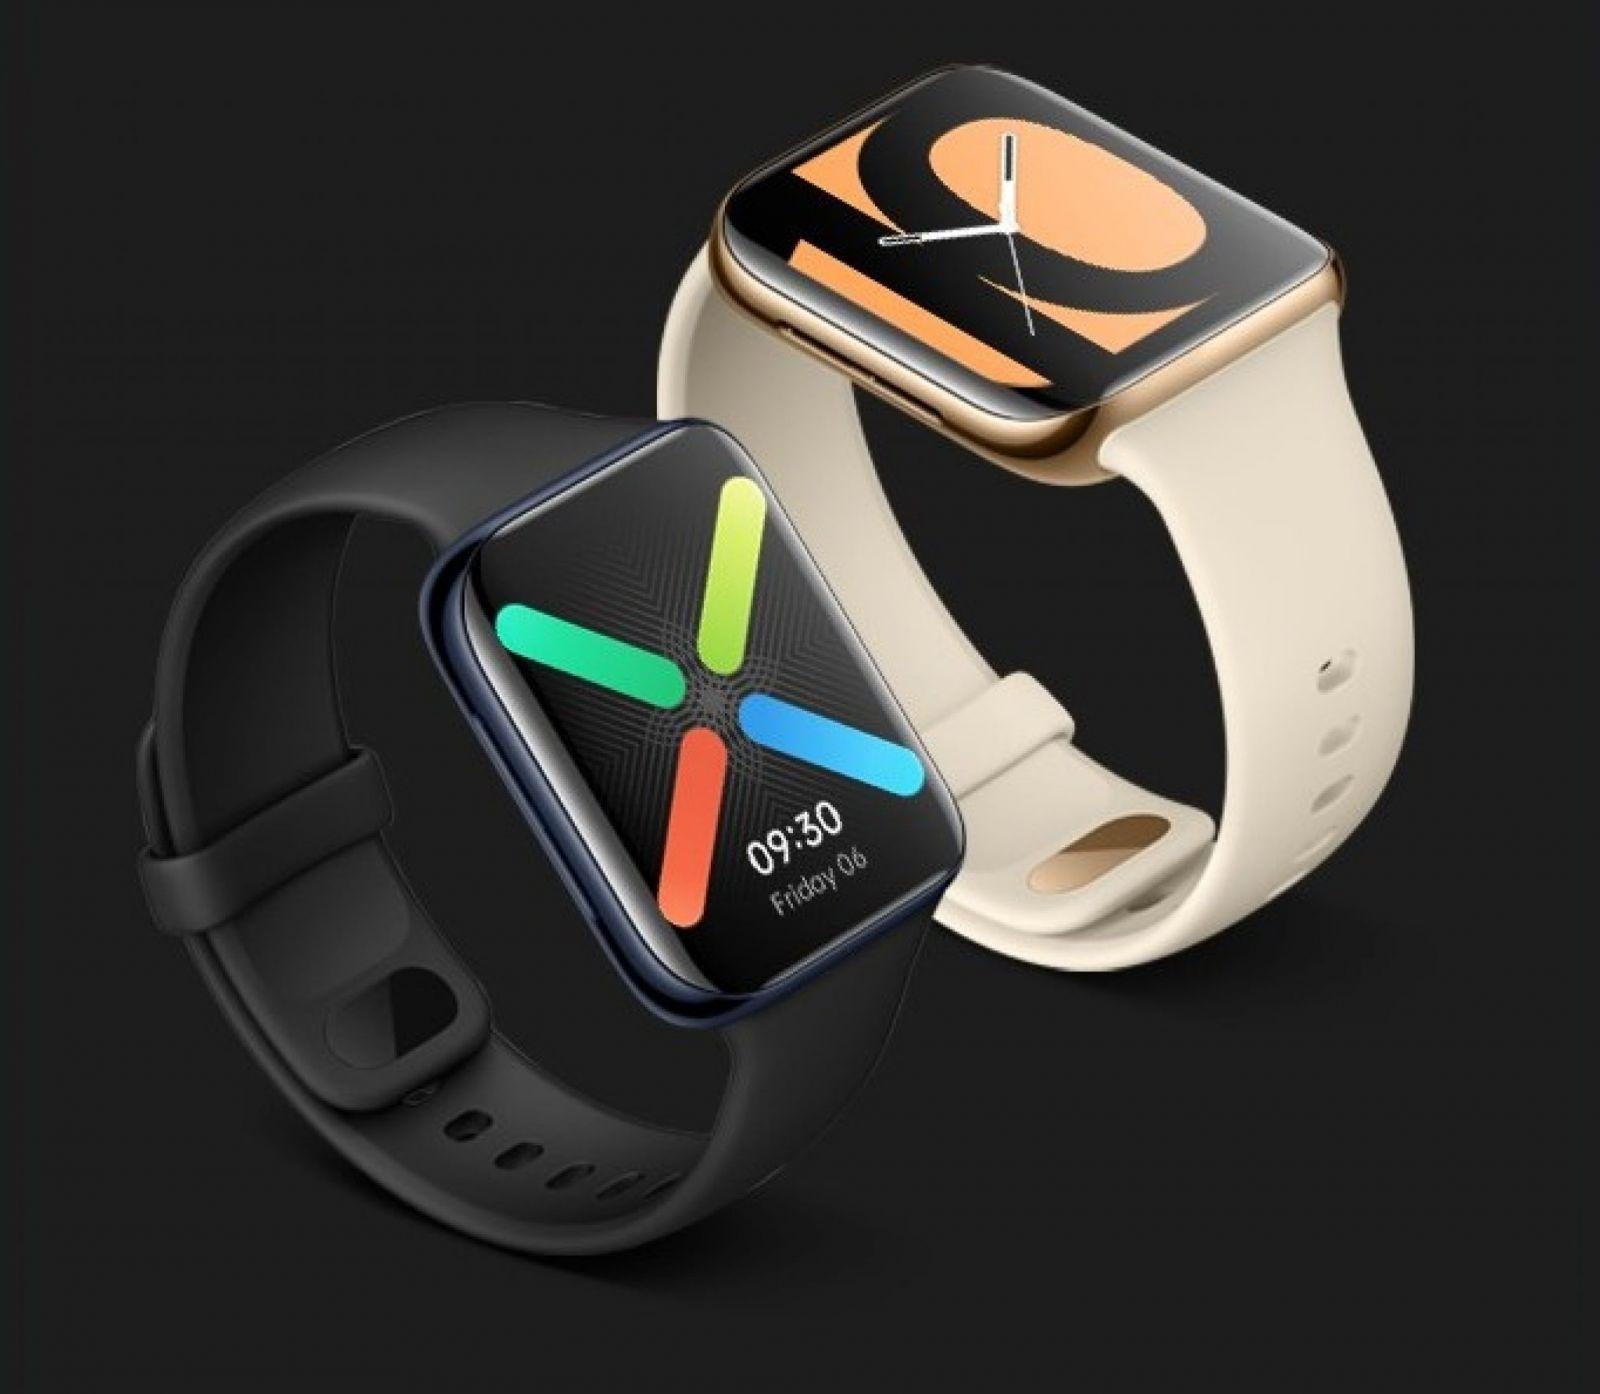 OPPO представила смарт-часы OPPO Watch в России (img 20200306 063231 2048x1784 1)